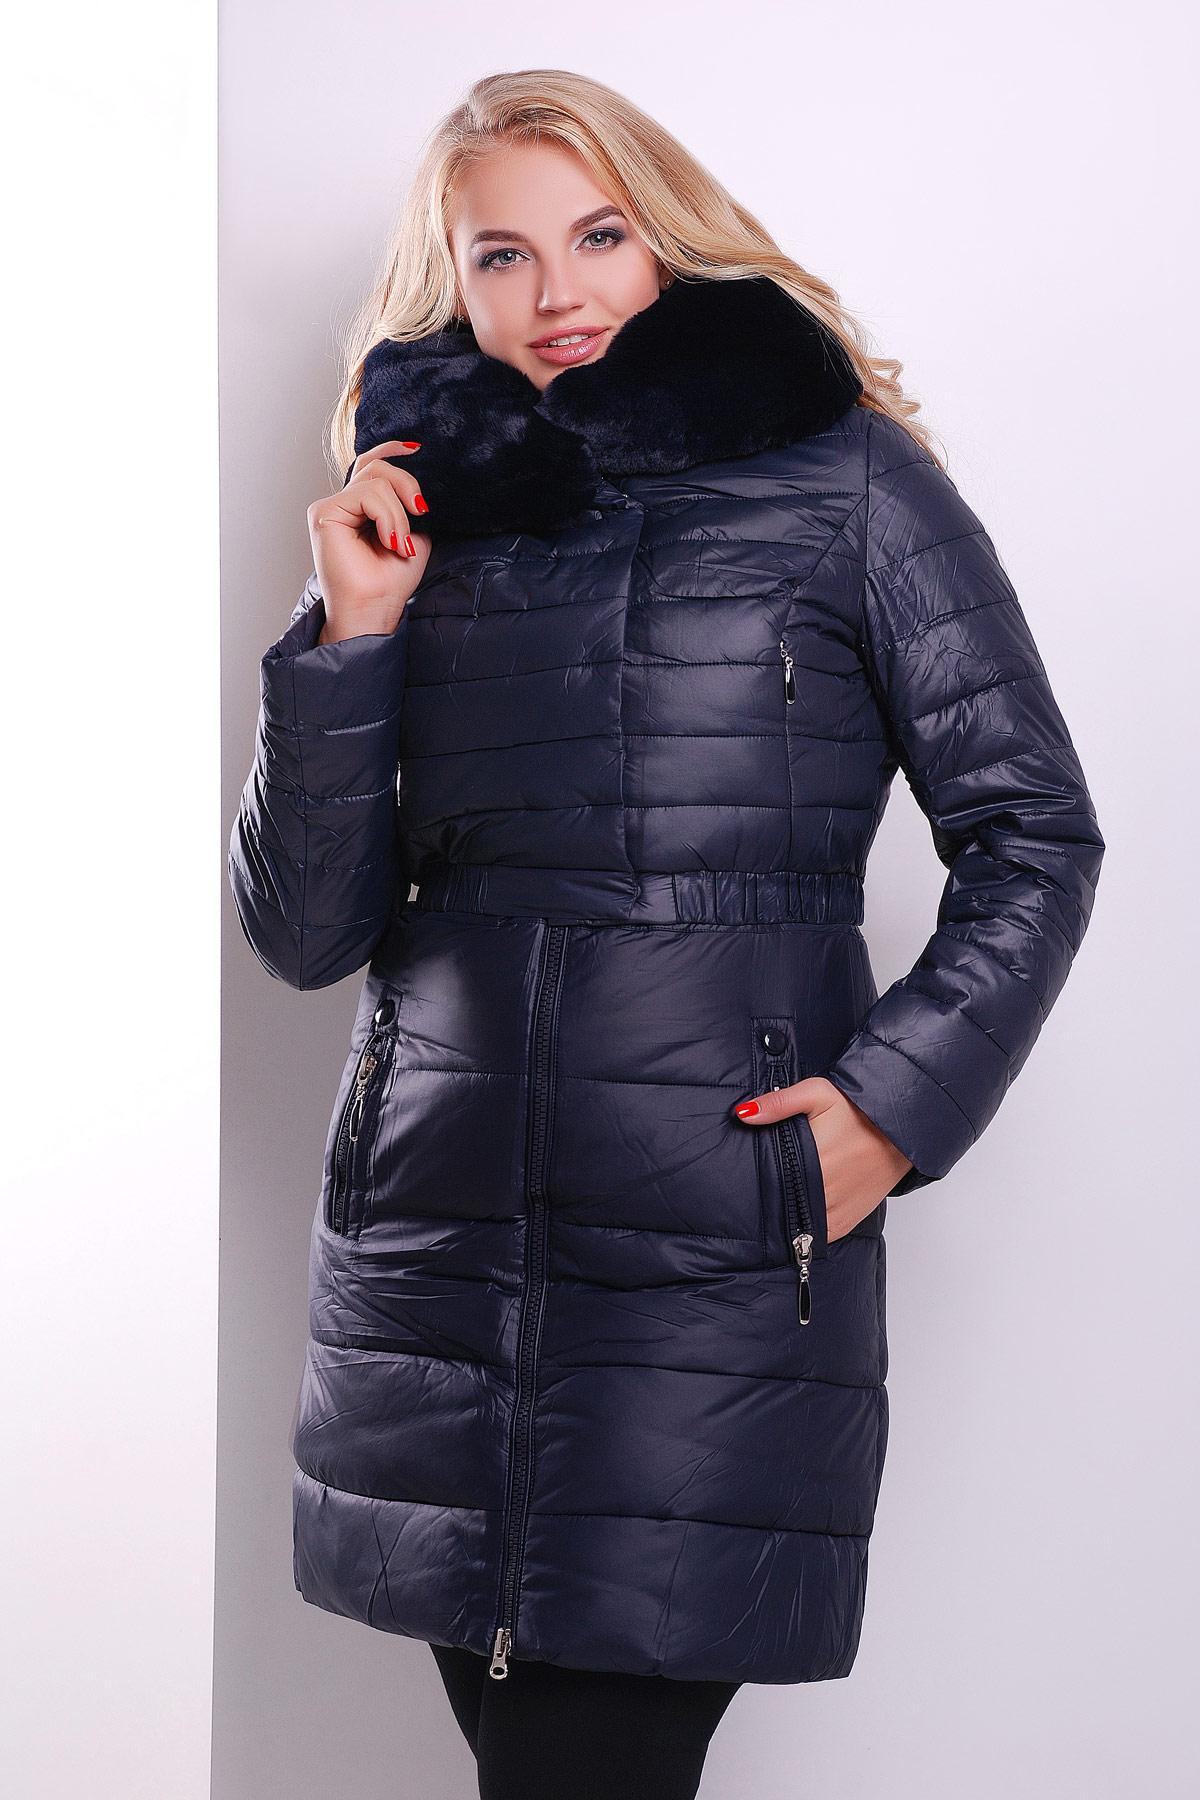 e4cc39922ac Зимняя куртка-двойка красного цвета. Куртка 13. Цвет  темно синий